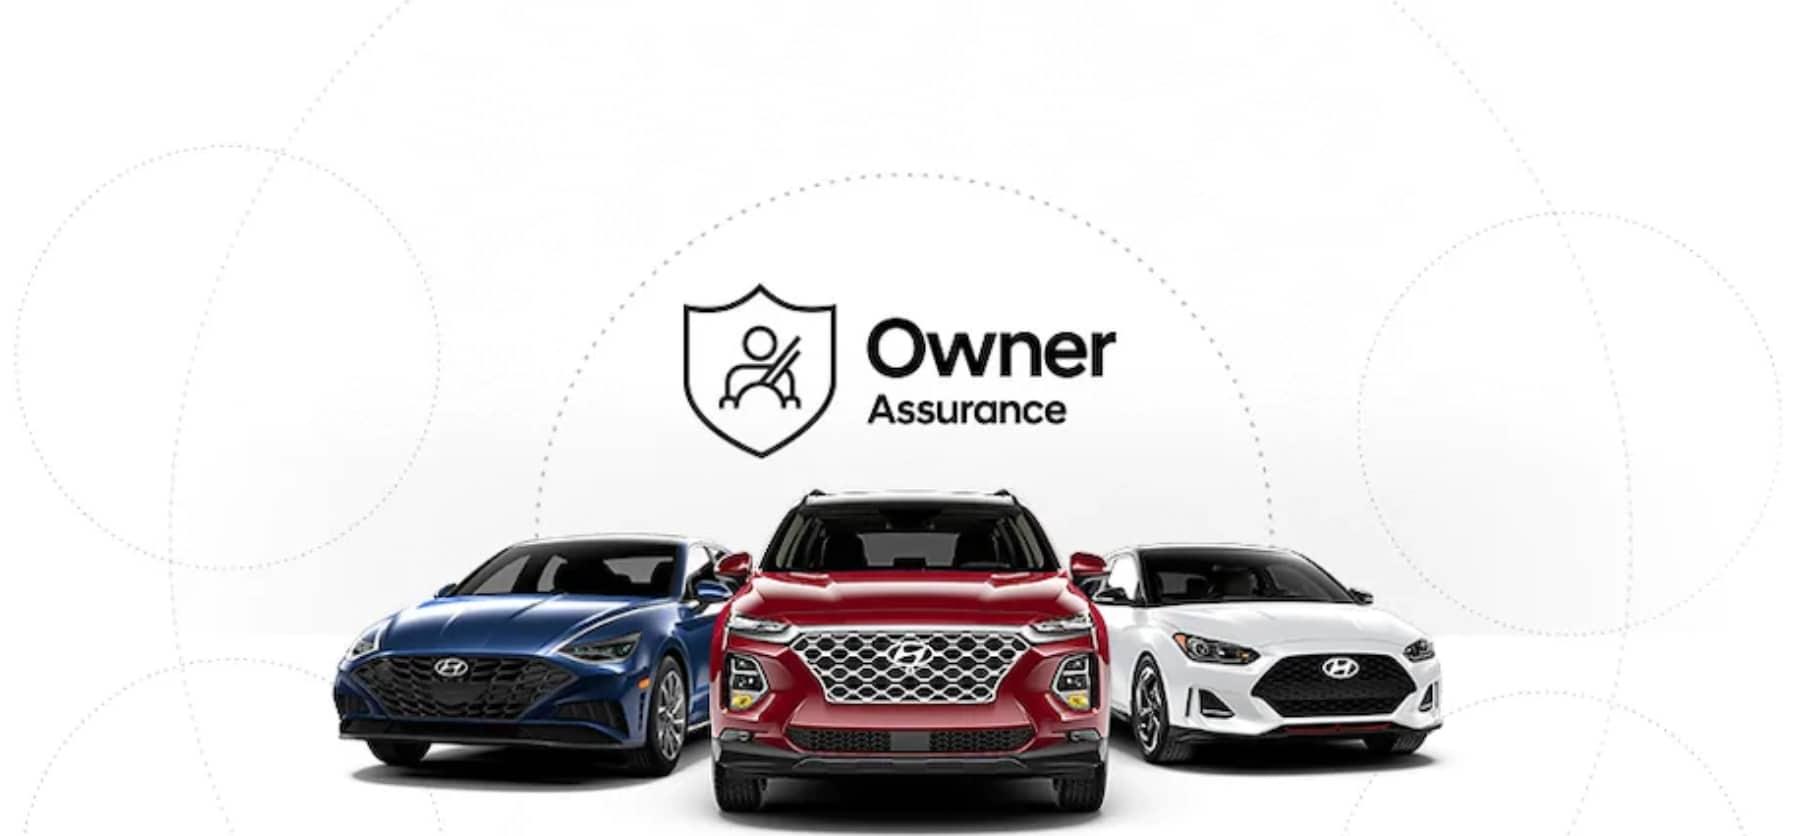 Hyundai Owner Assurance Program